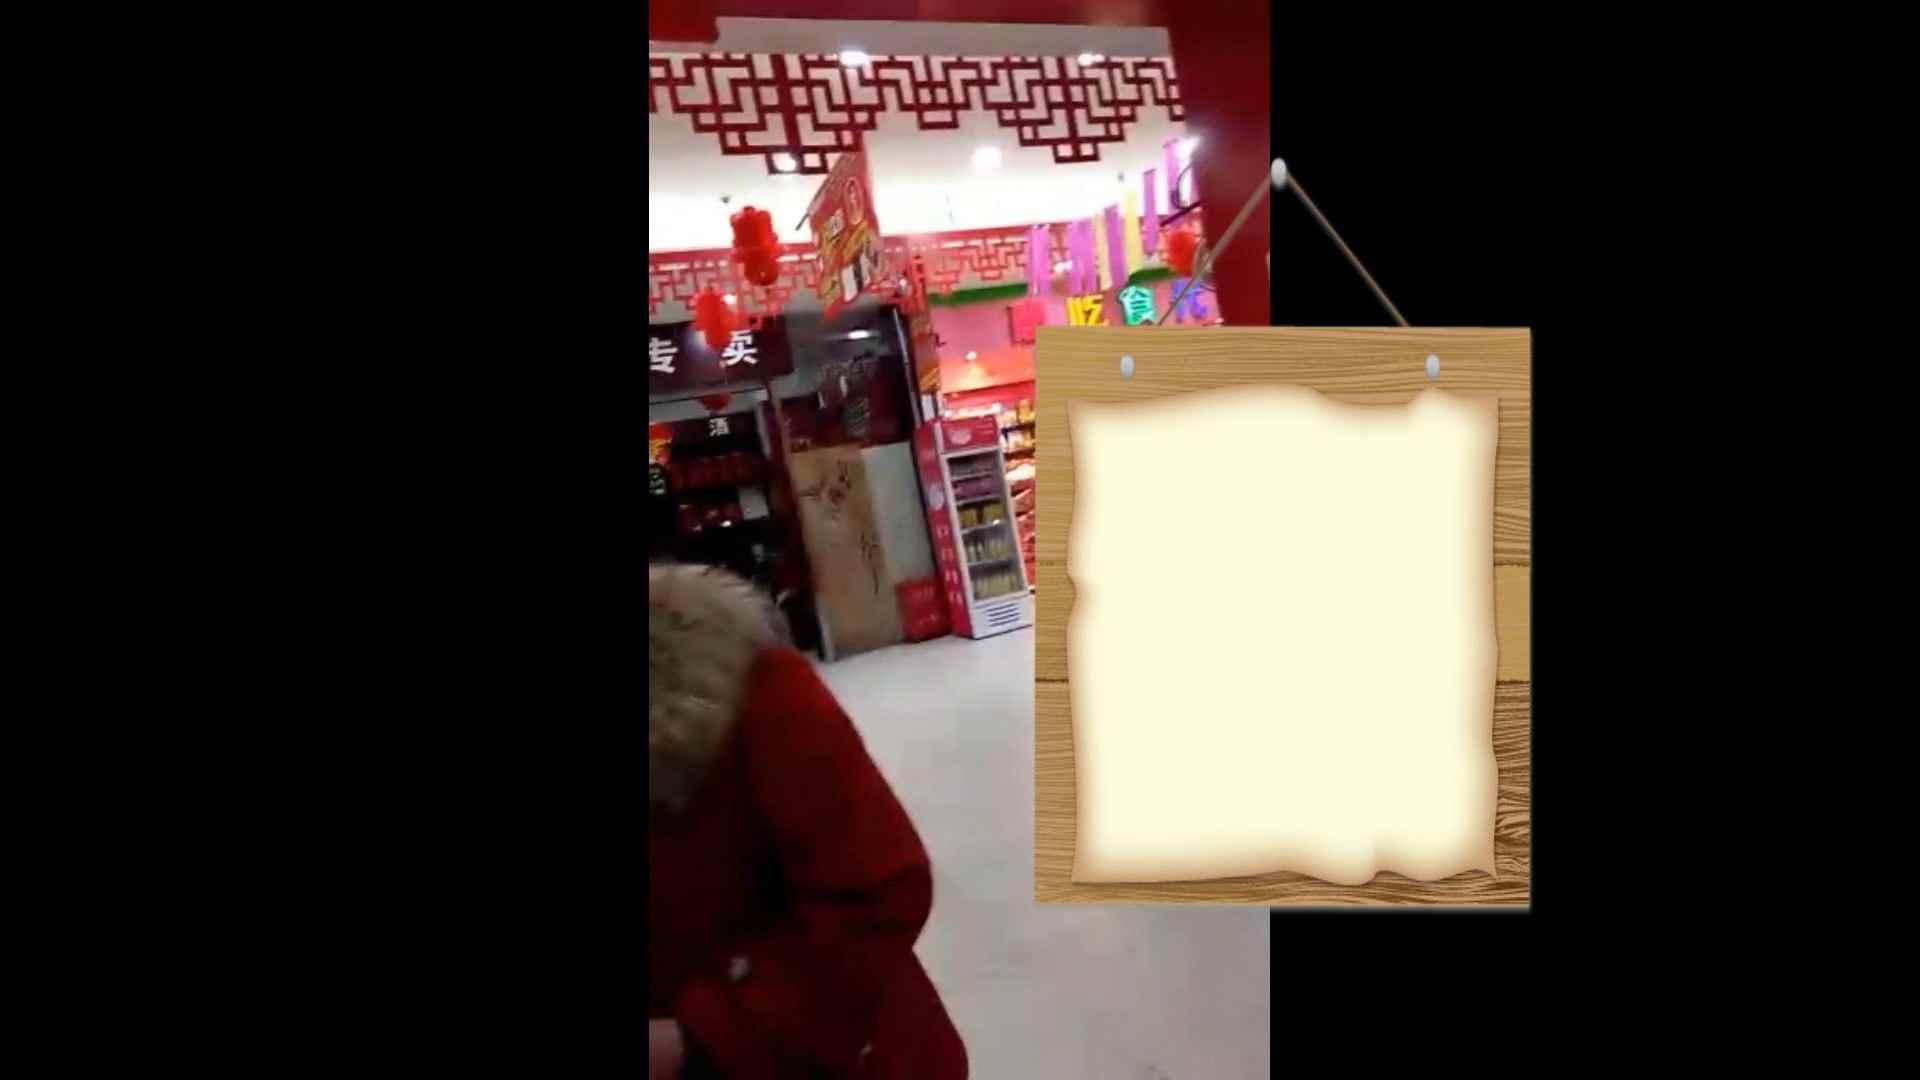 芸術大学ガチ潜入盗撮 JD盗撮 美女の洗面所の秘密 Vol.104 盗撮  63pic 20